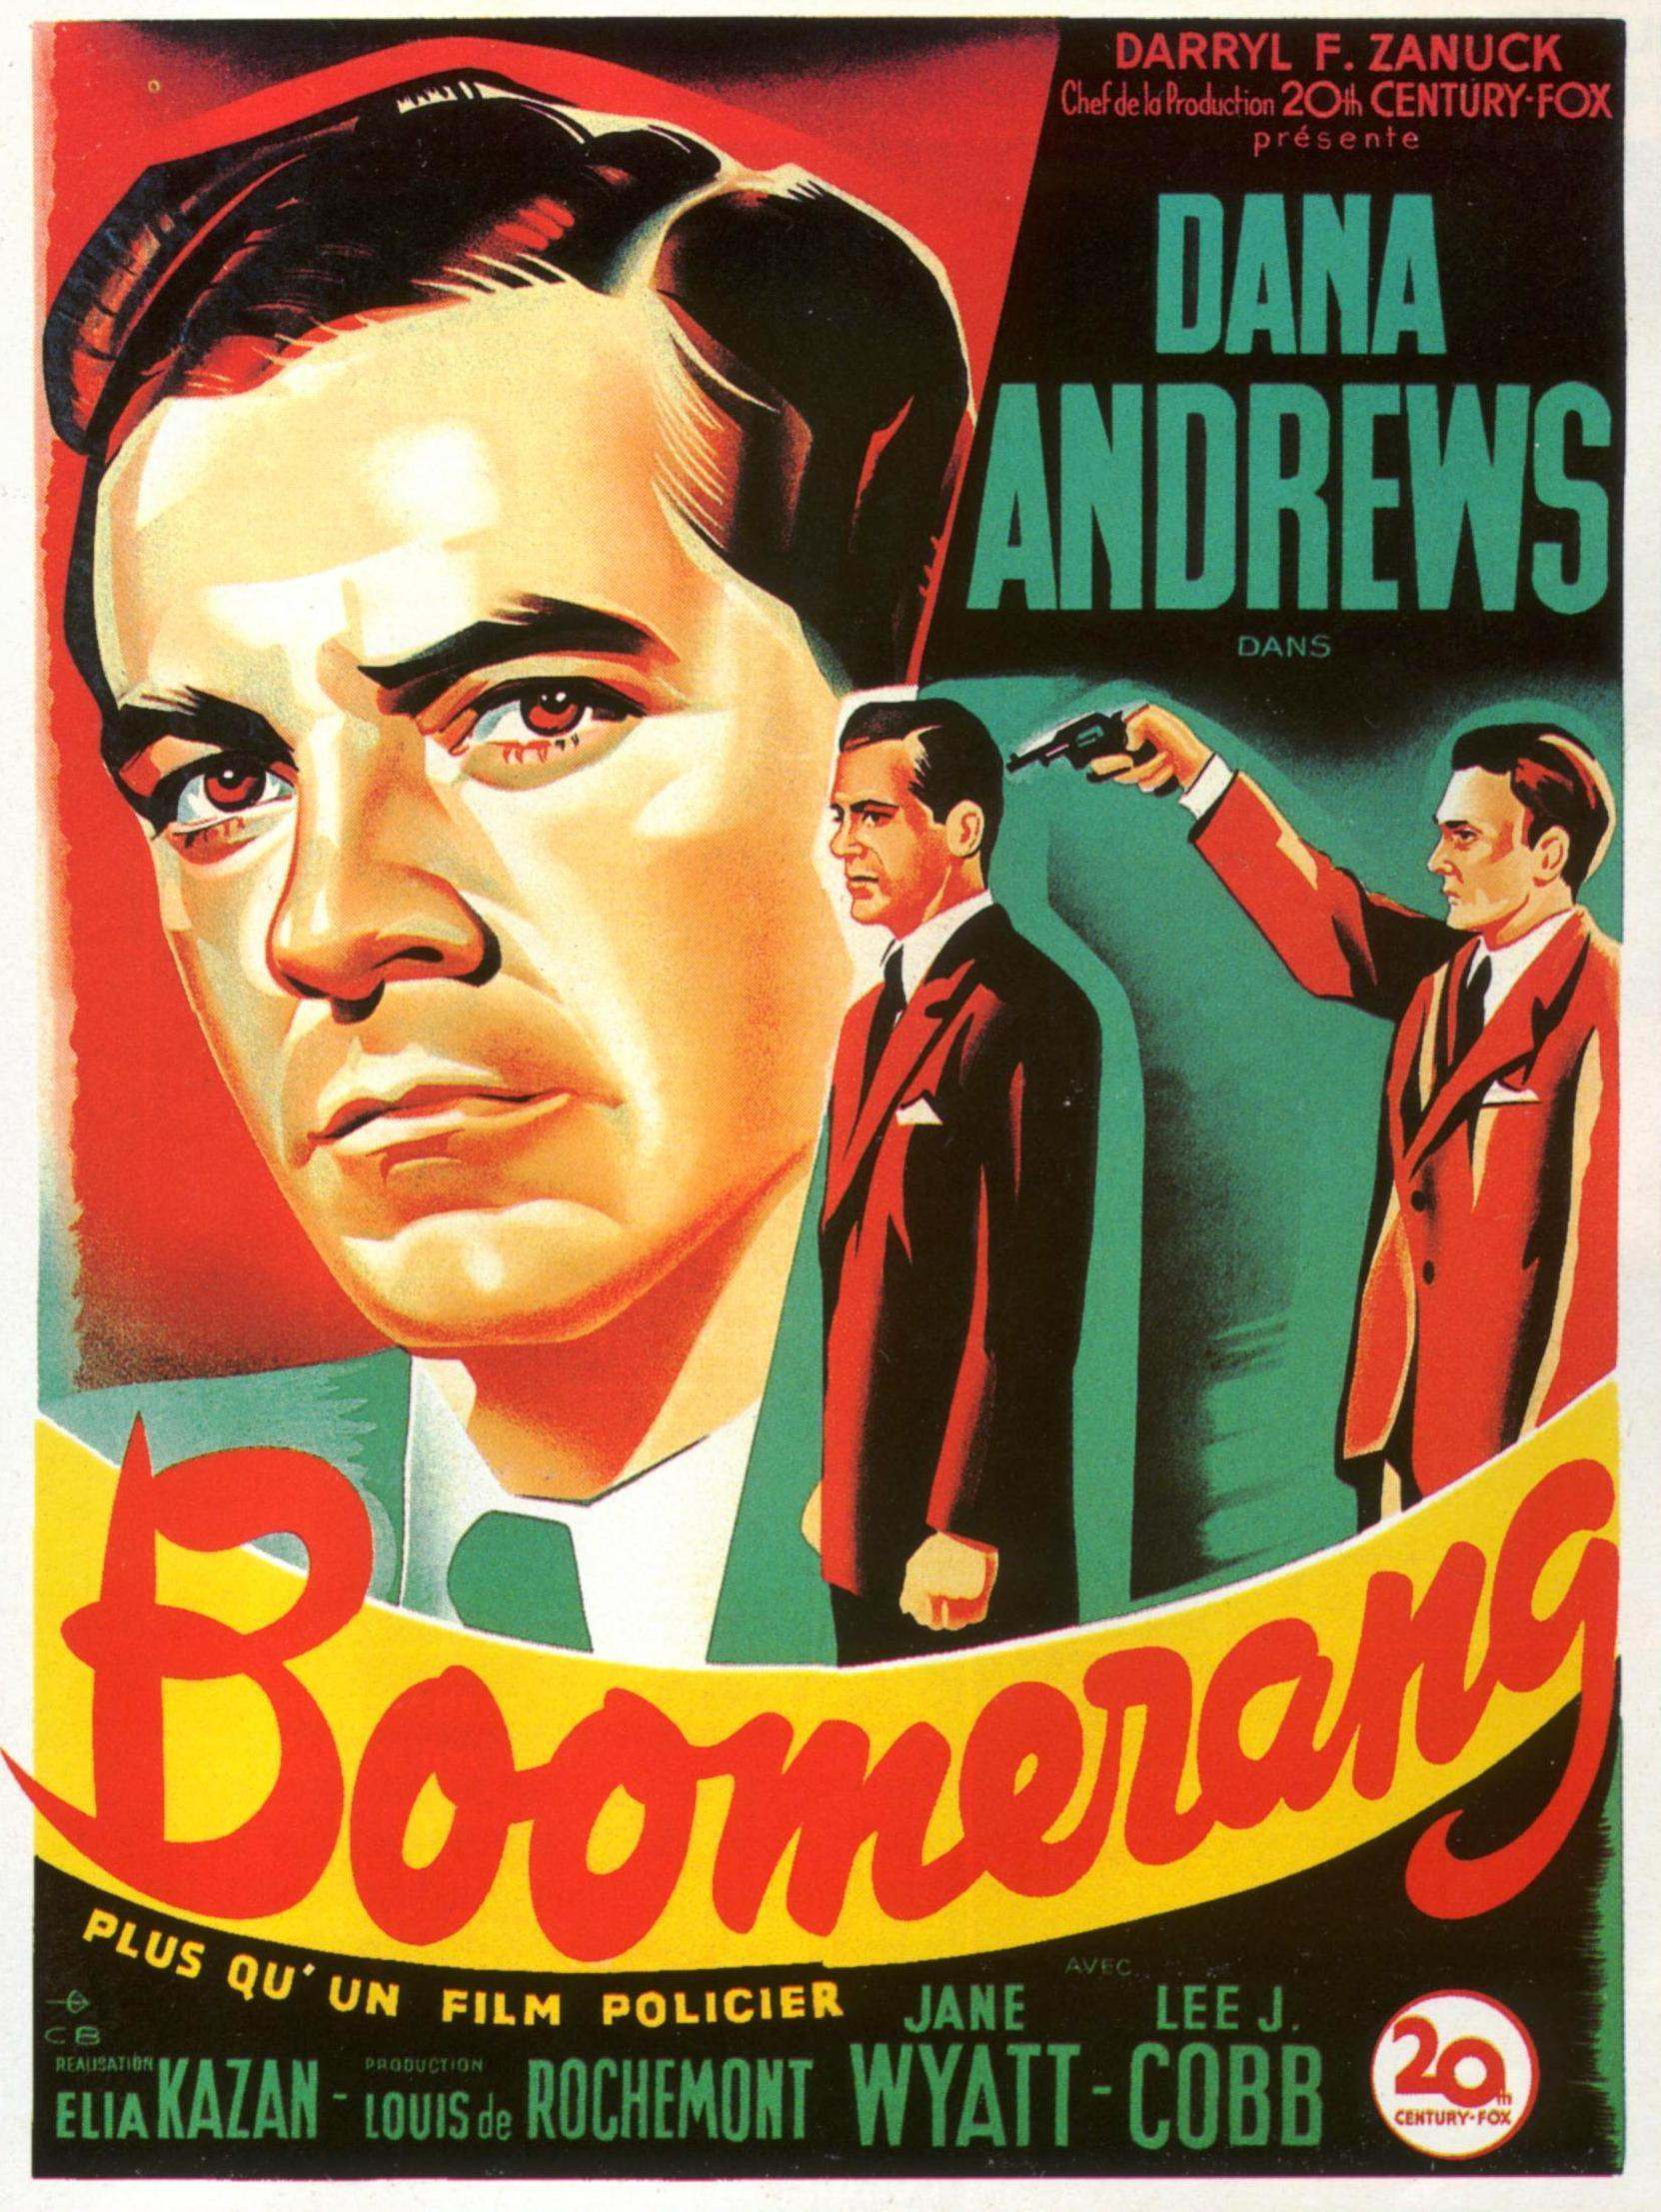 Boomerang! kapak